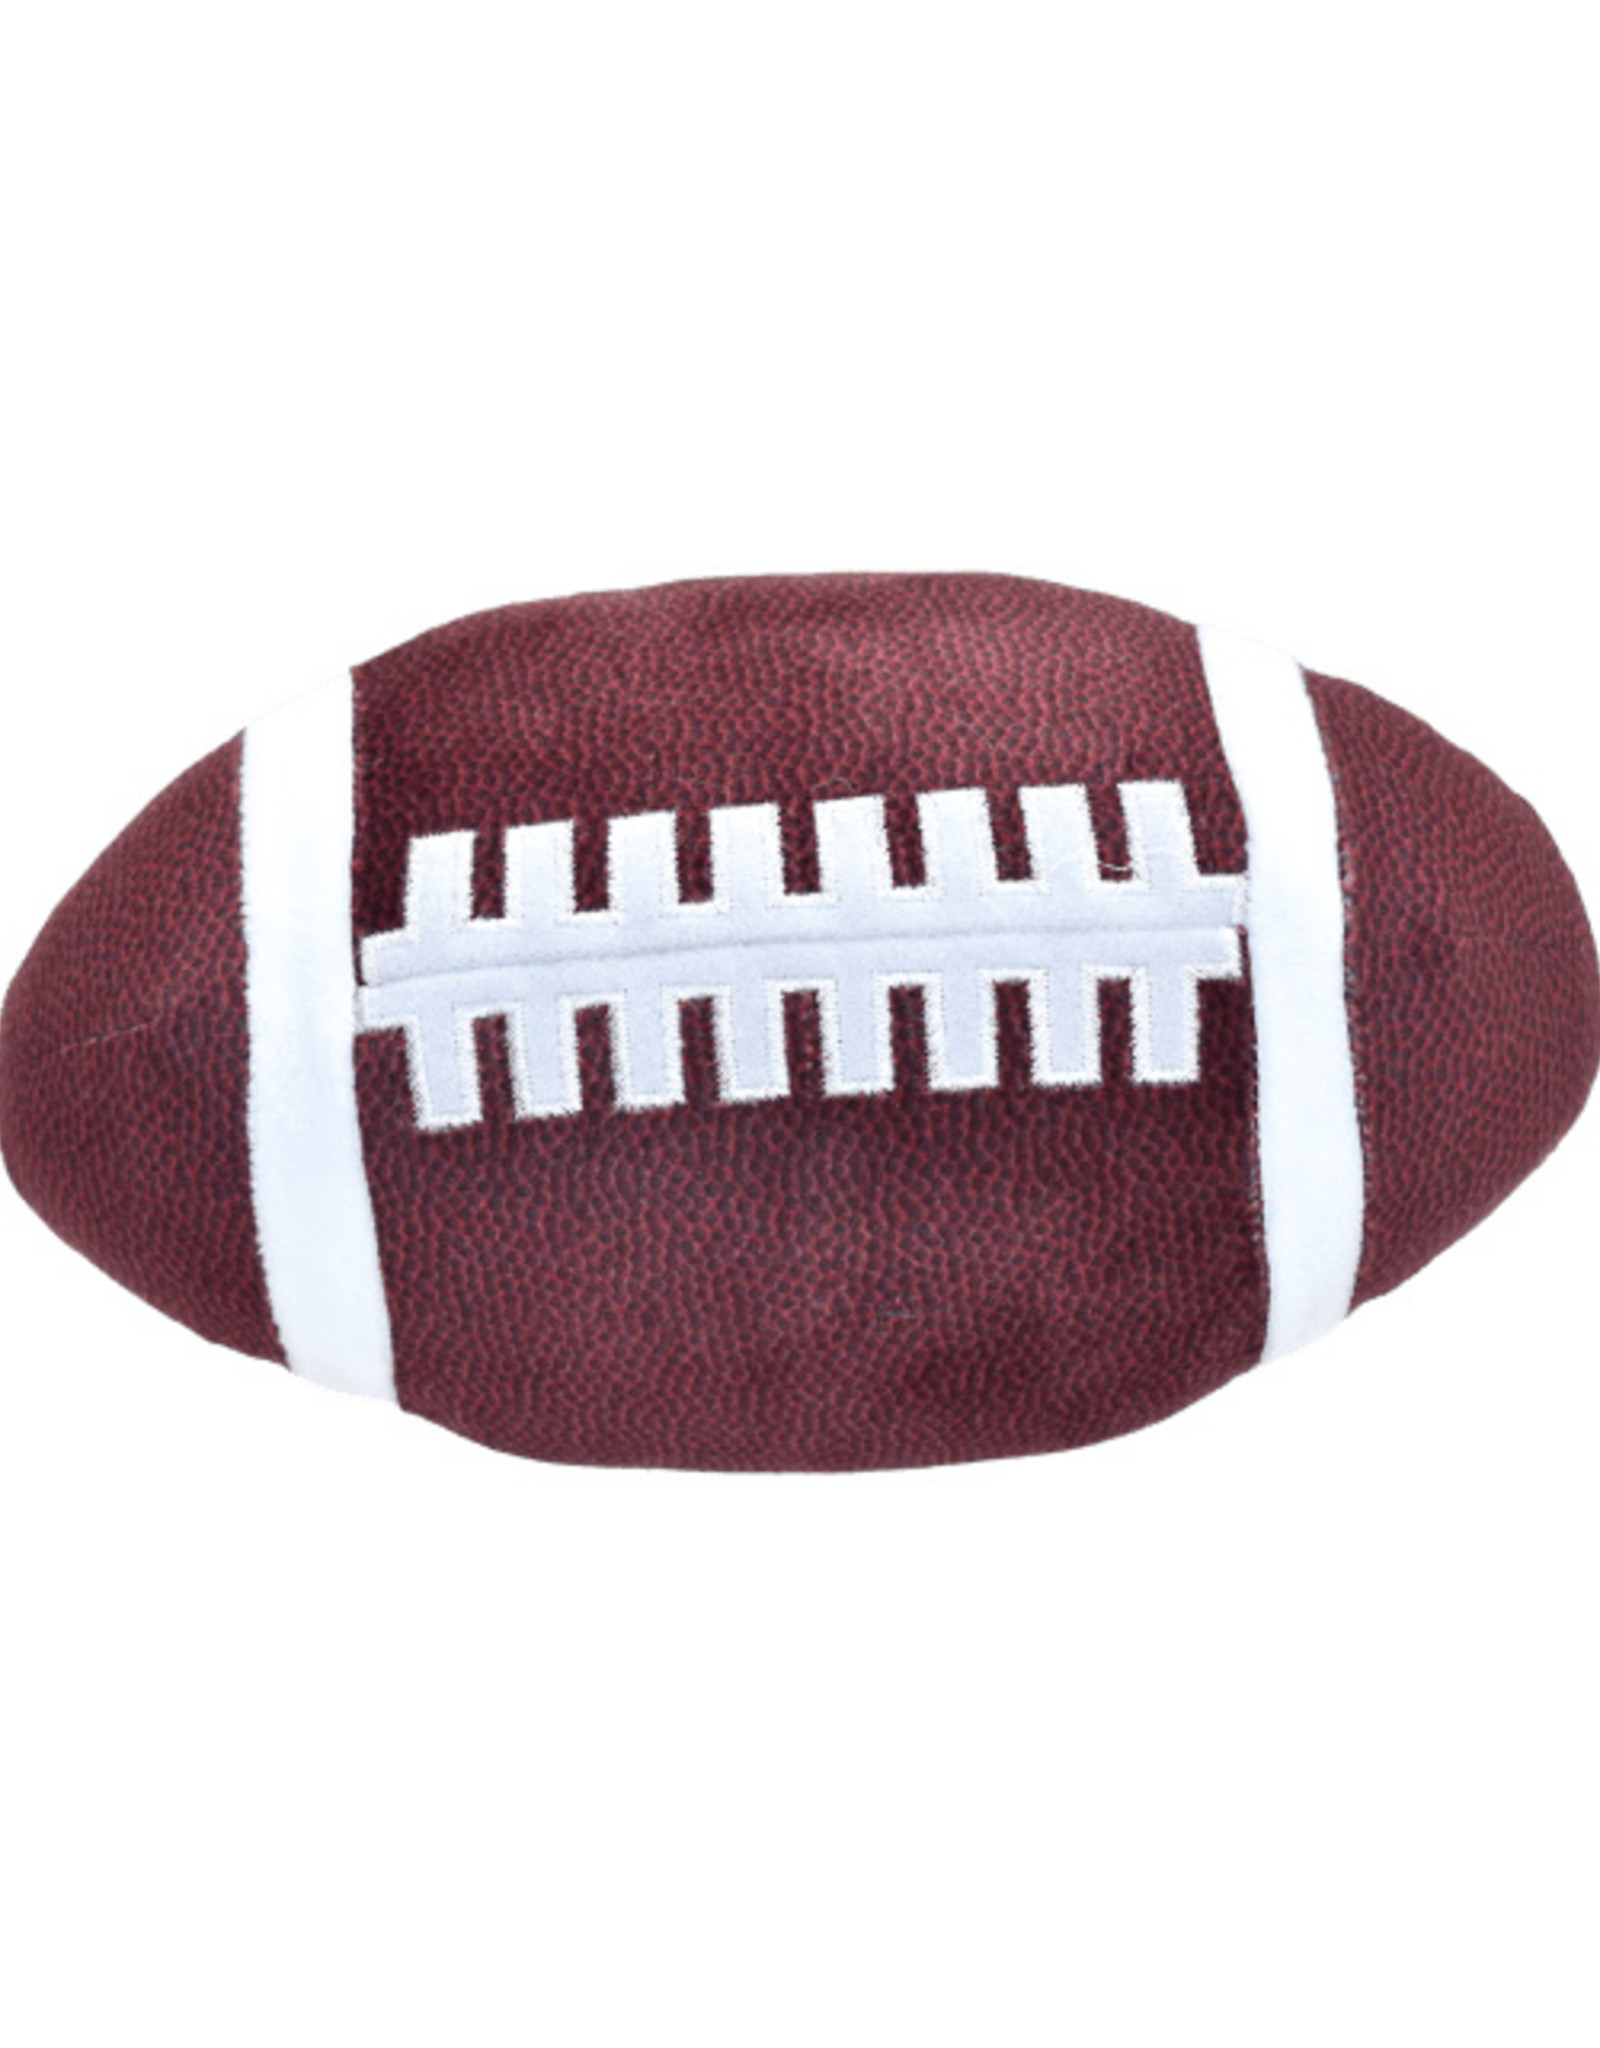 Iscream Football Microbead Pillow